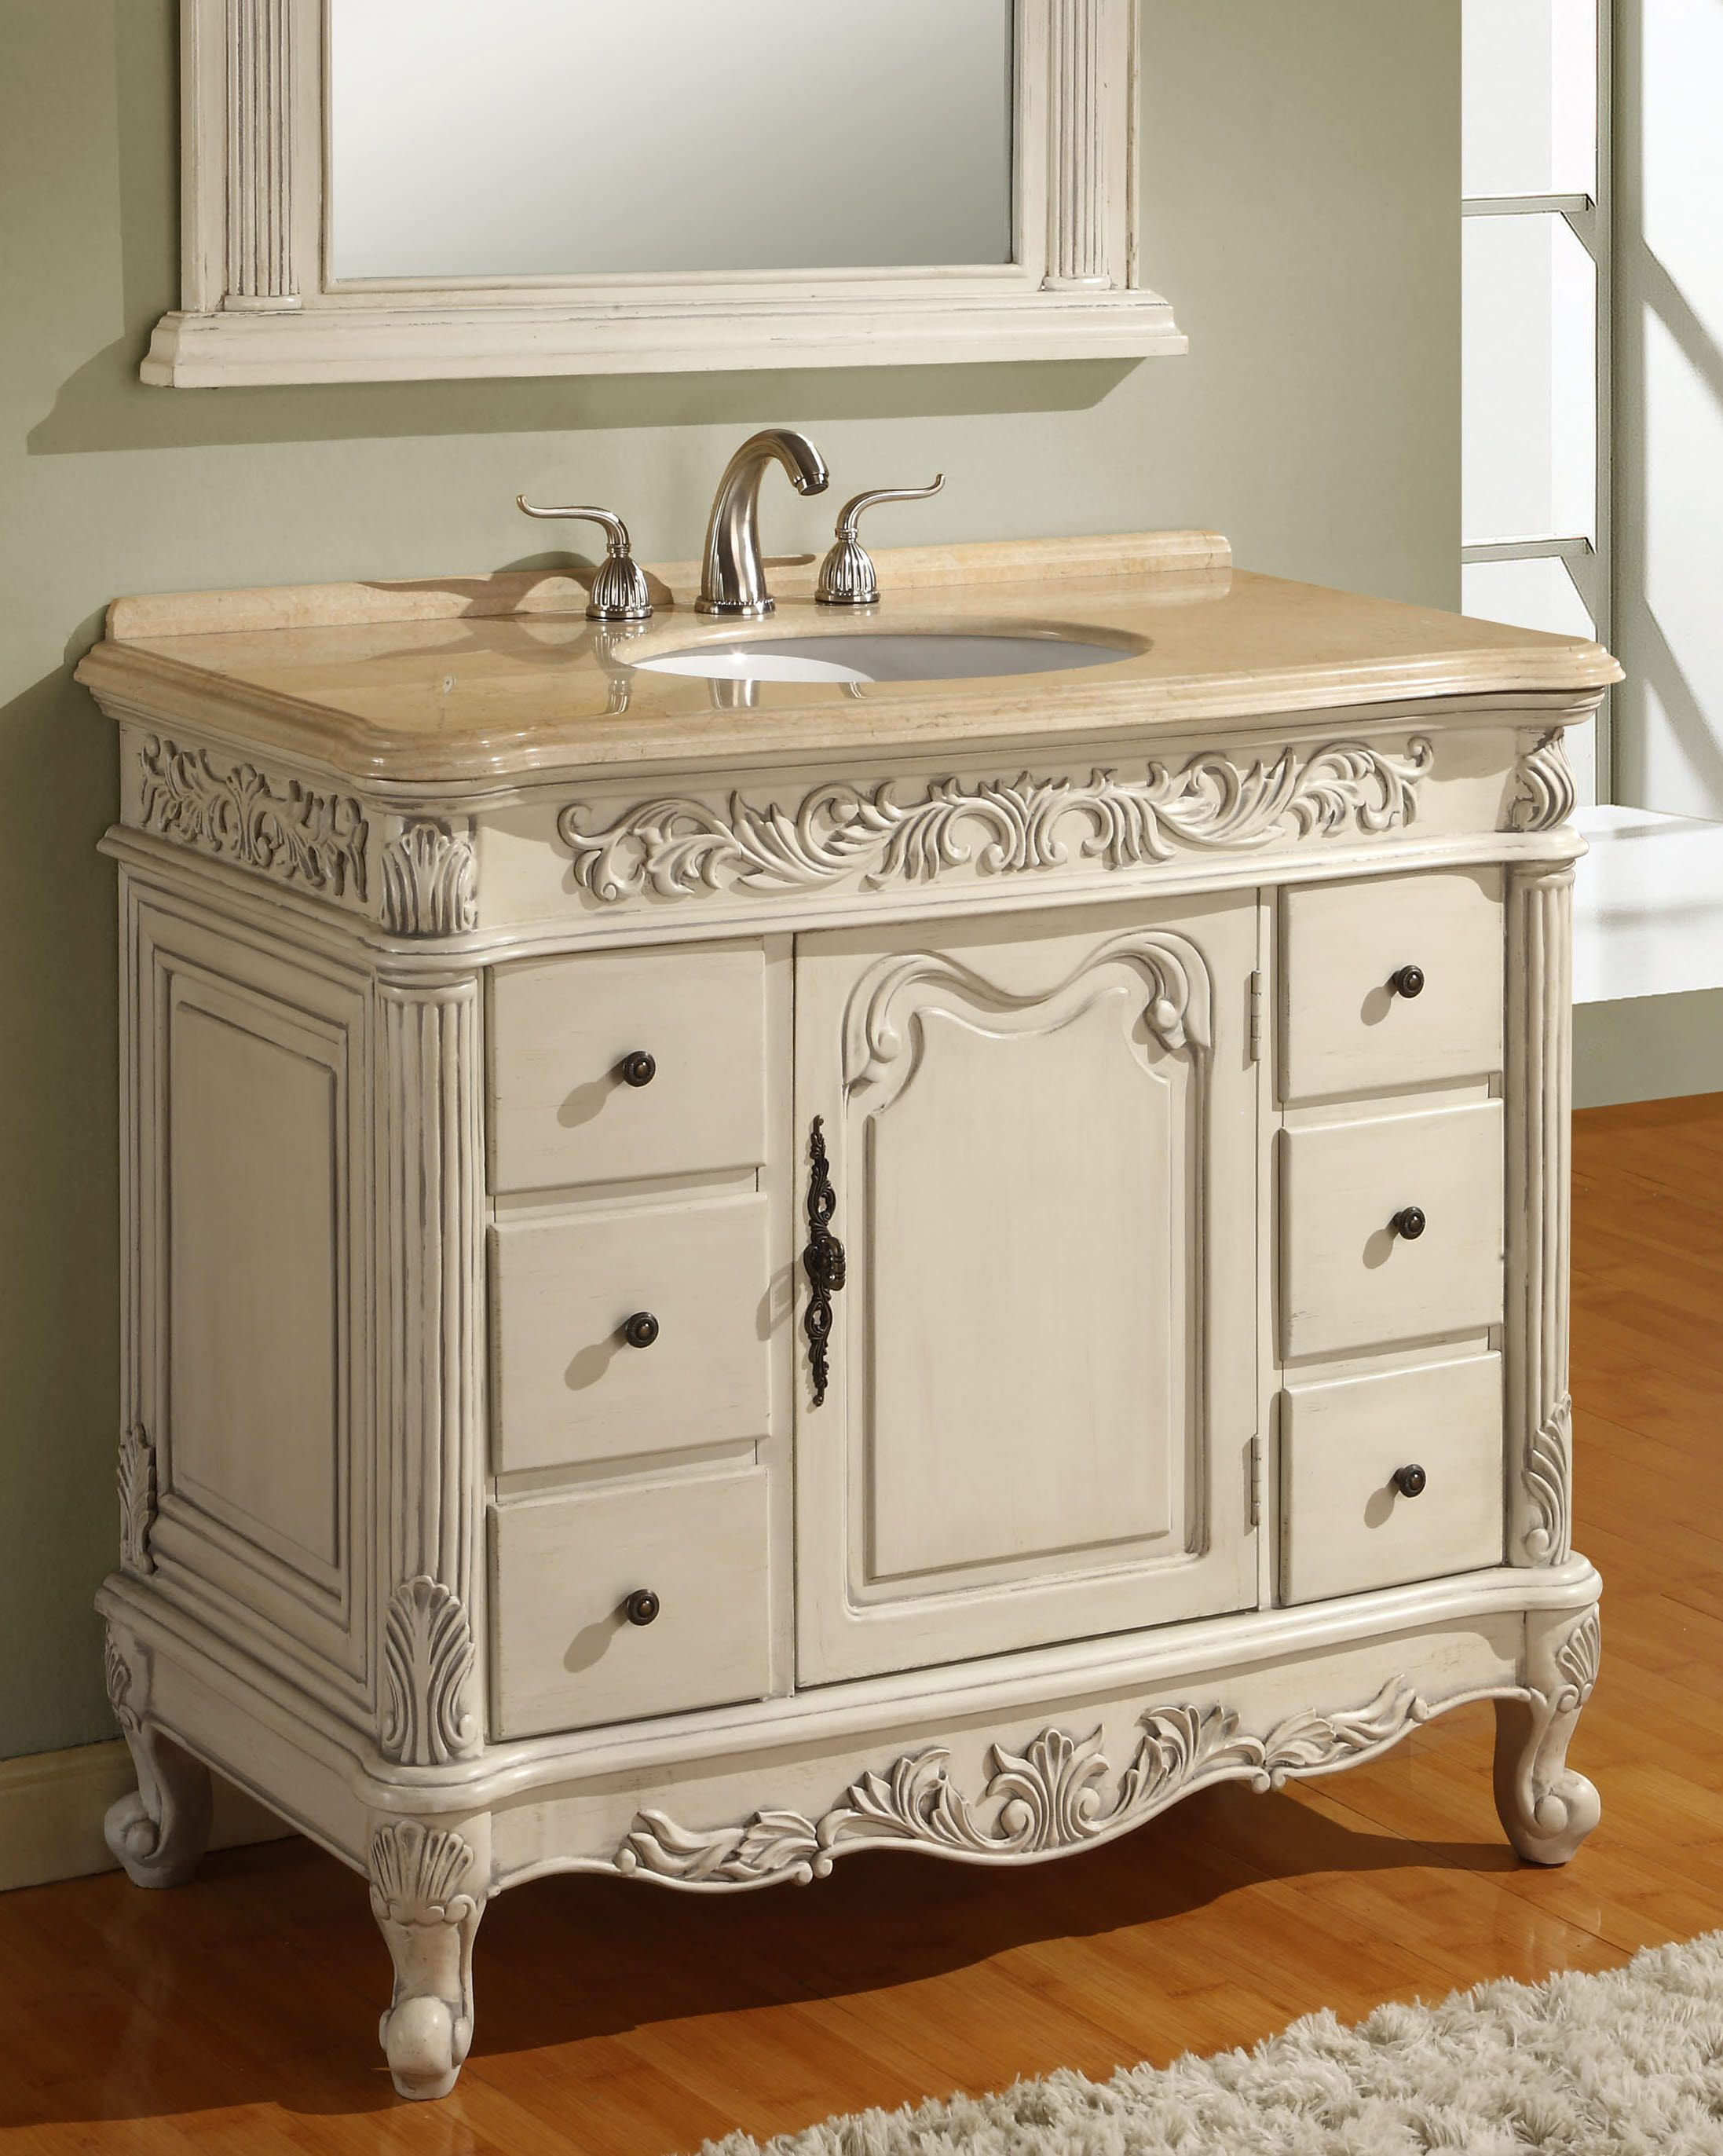 Antique Style 40 Inch Bath Vanity  Item 4340  One Shelf Six Prepossessing 40 Inch Bathroom Vanity Inspiration Design